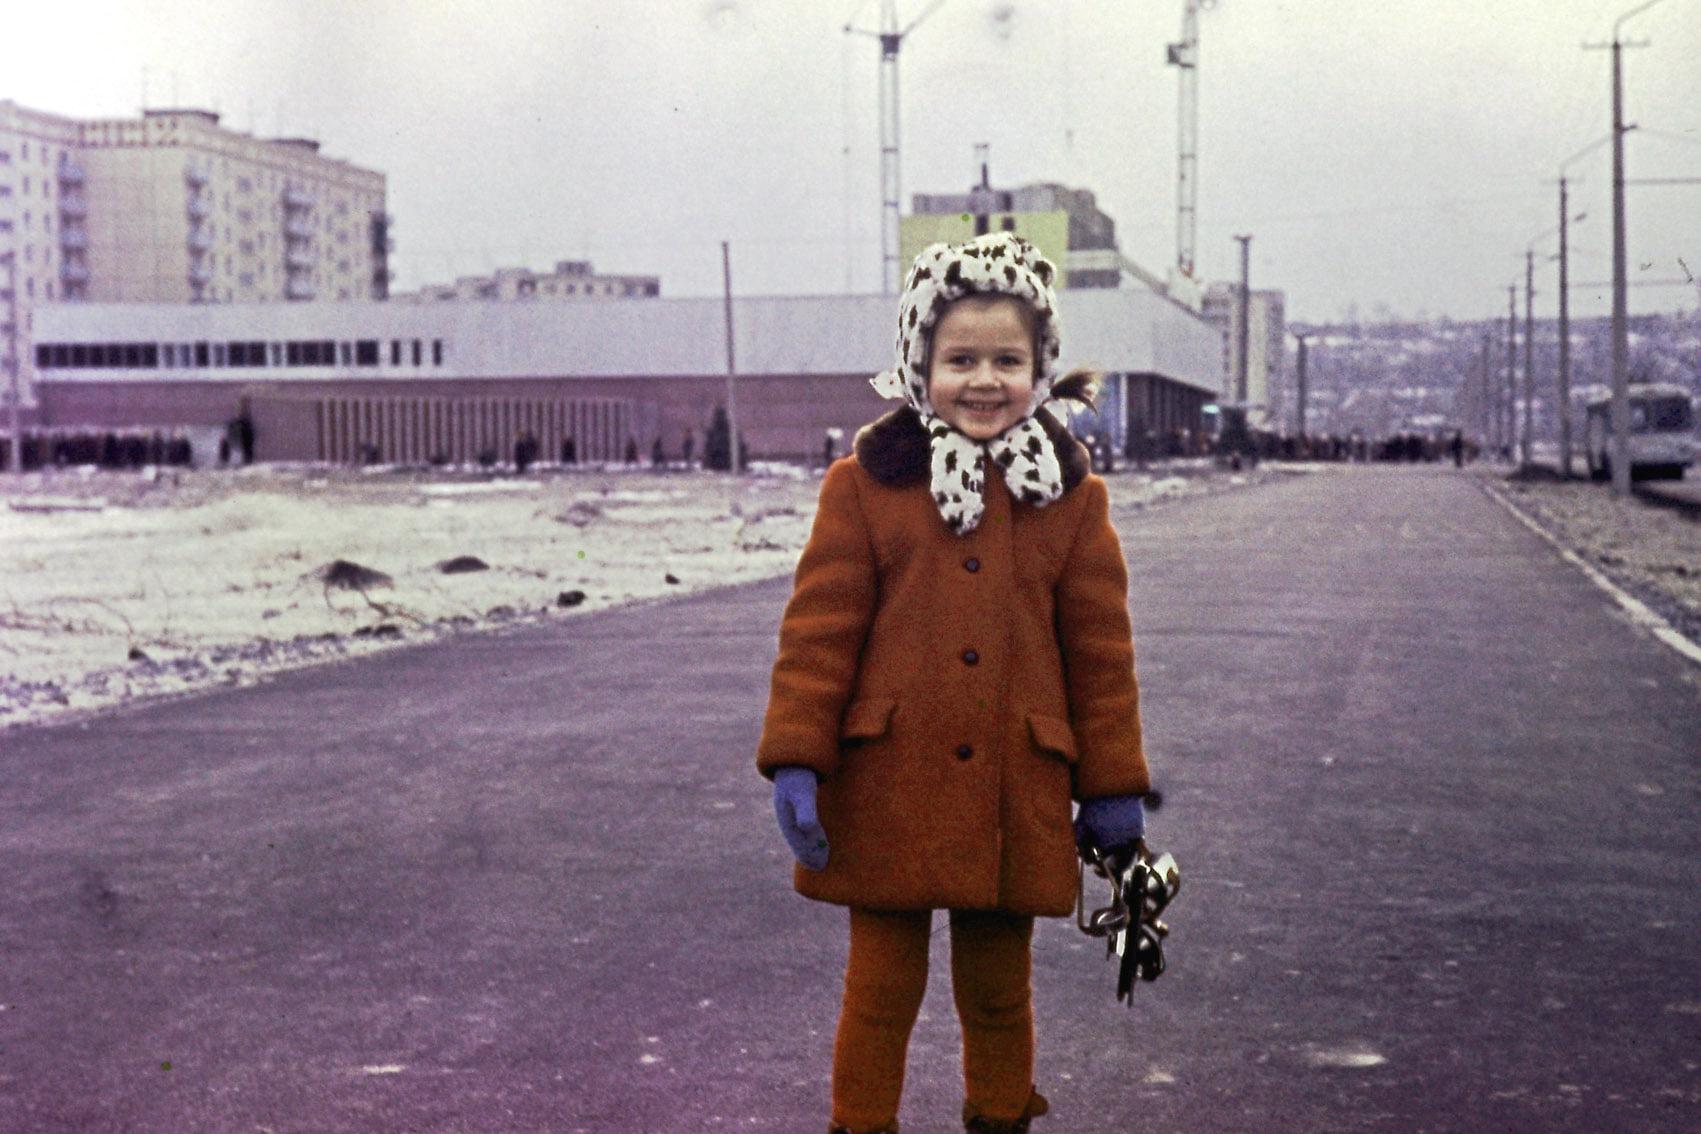 Дочка Гринёва Катя на фоне Универсама (фото Валентина Гринёва) Жилмассиву Победа в Днепре – 50 лет!